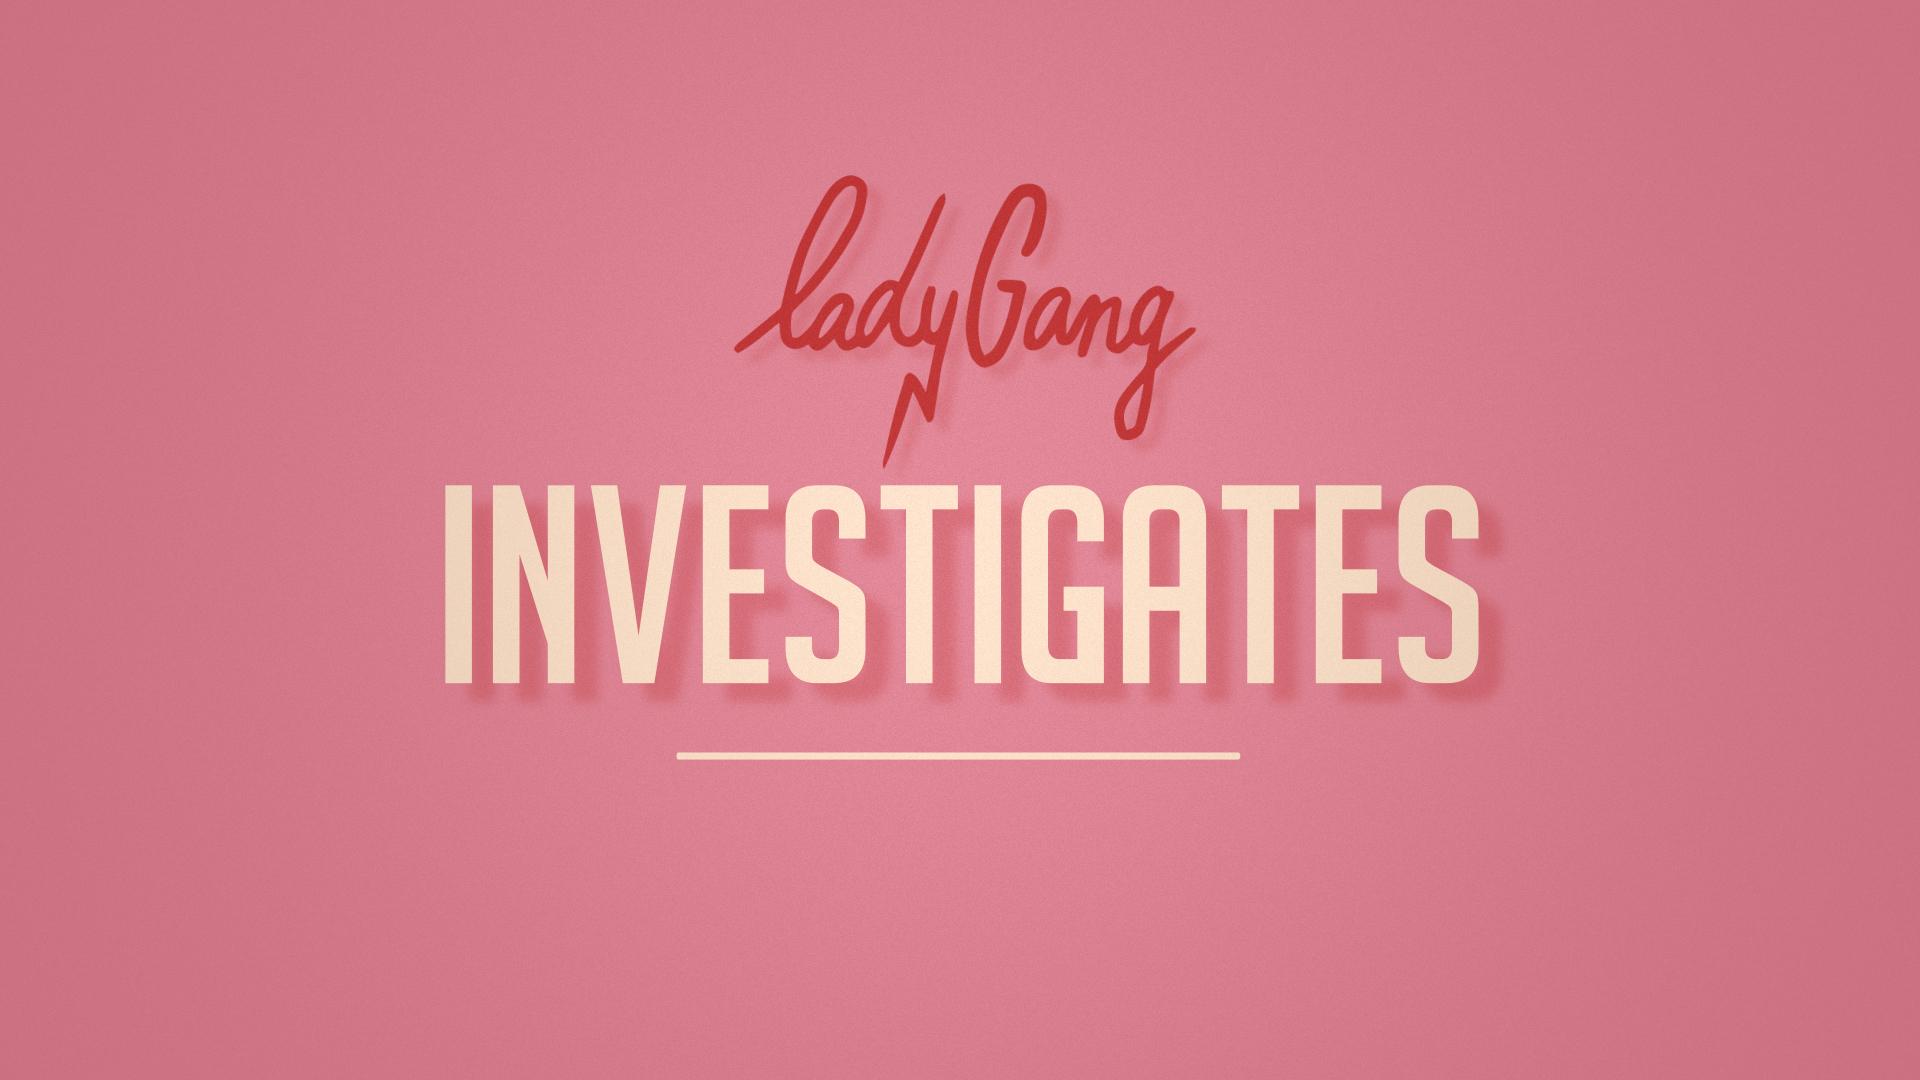 LadyGang_Styleframes_Investigates_04 (0-00-00-00)f.jpg